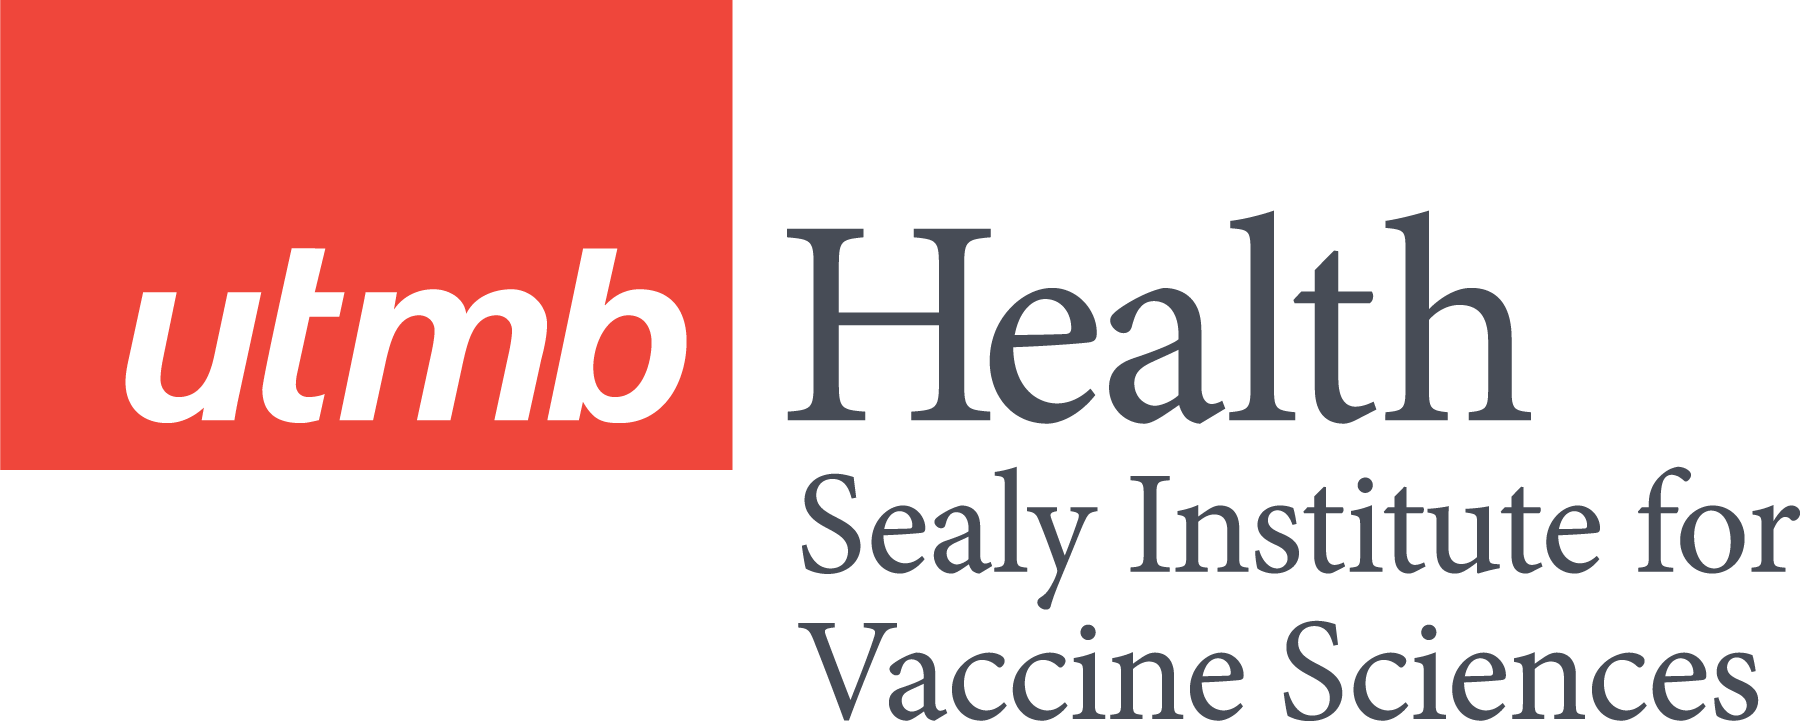 Sealy Institute for Vaccine Sciences